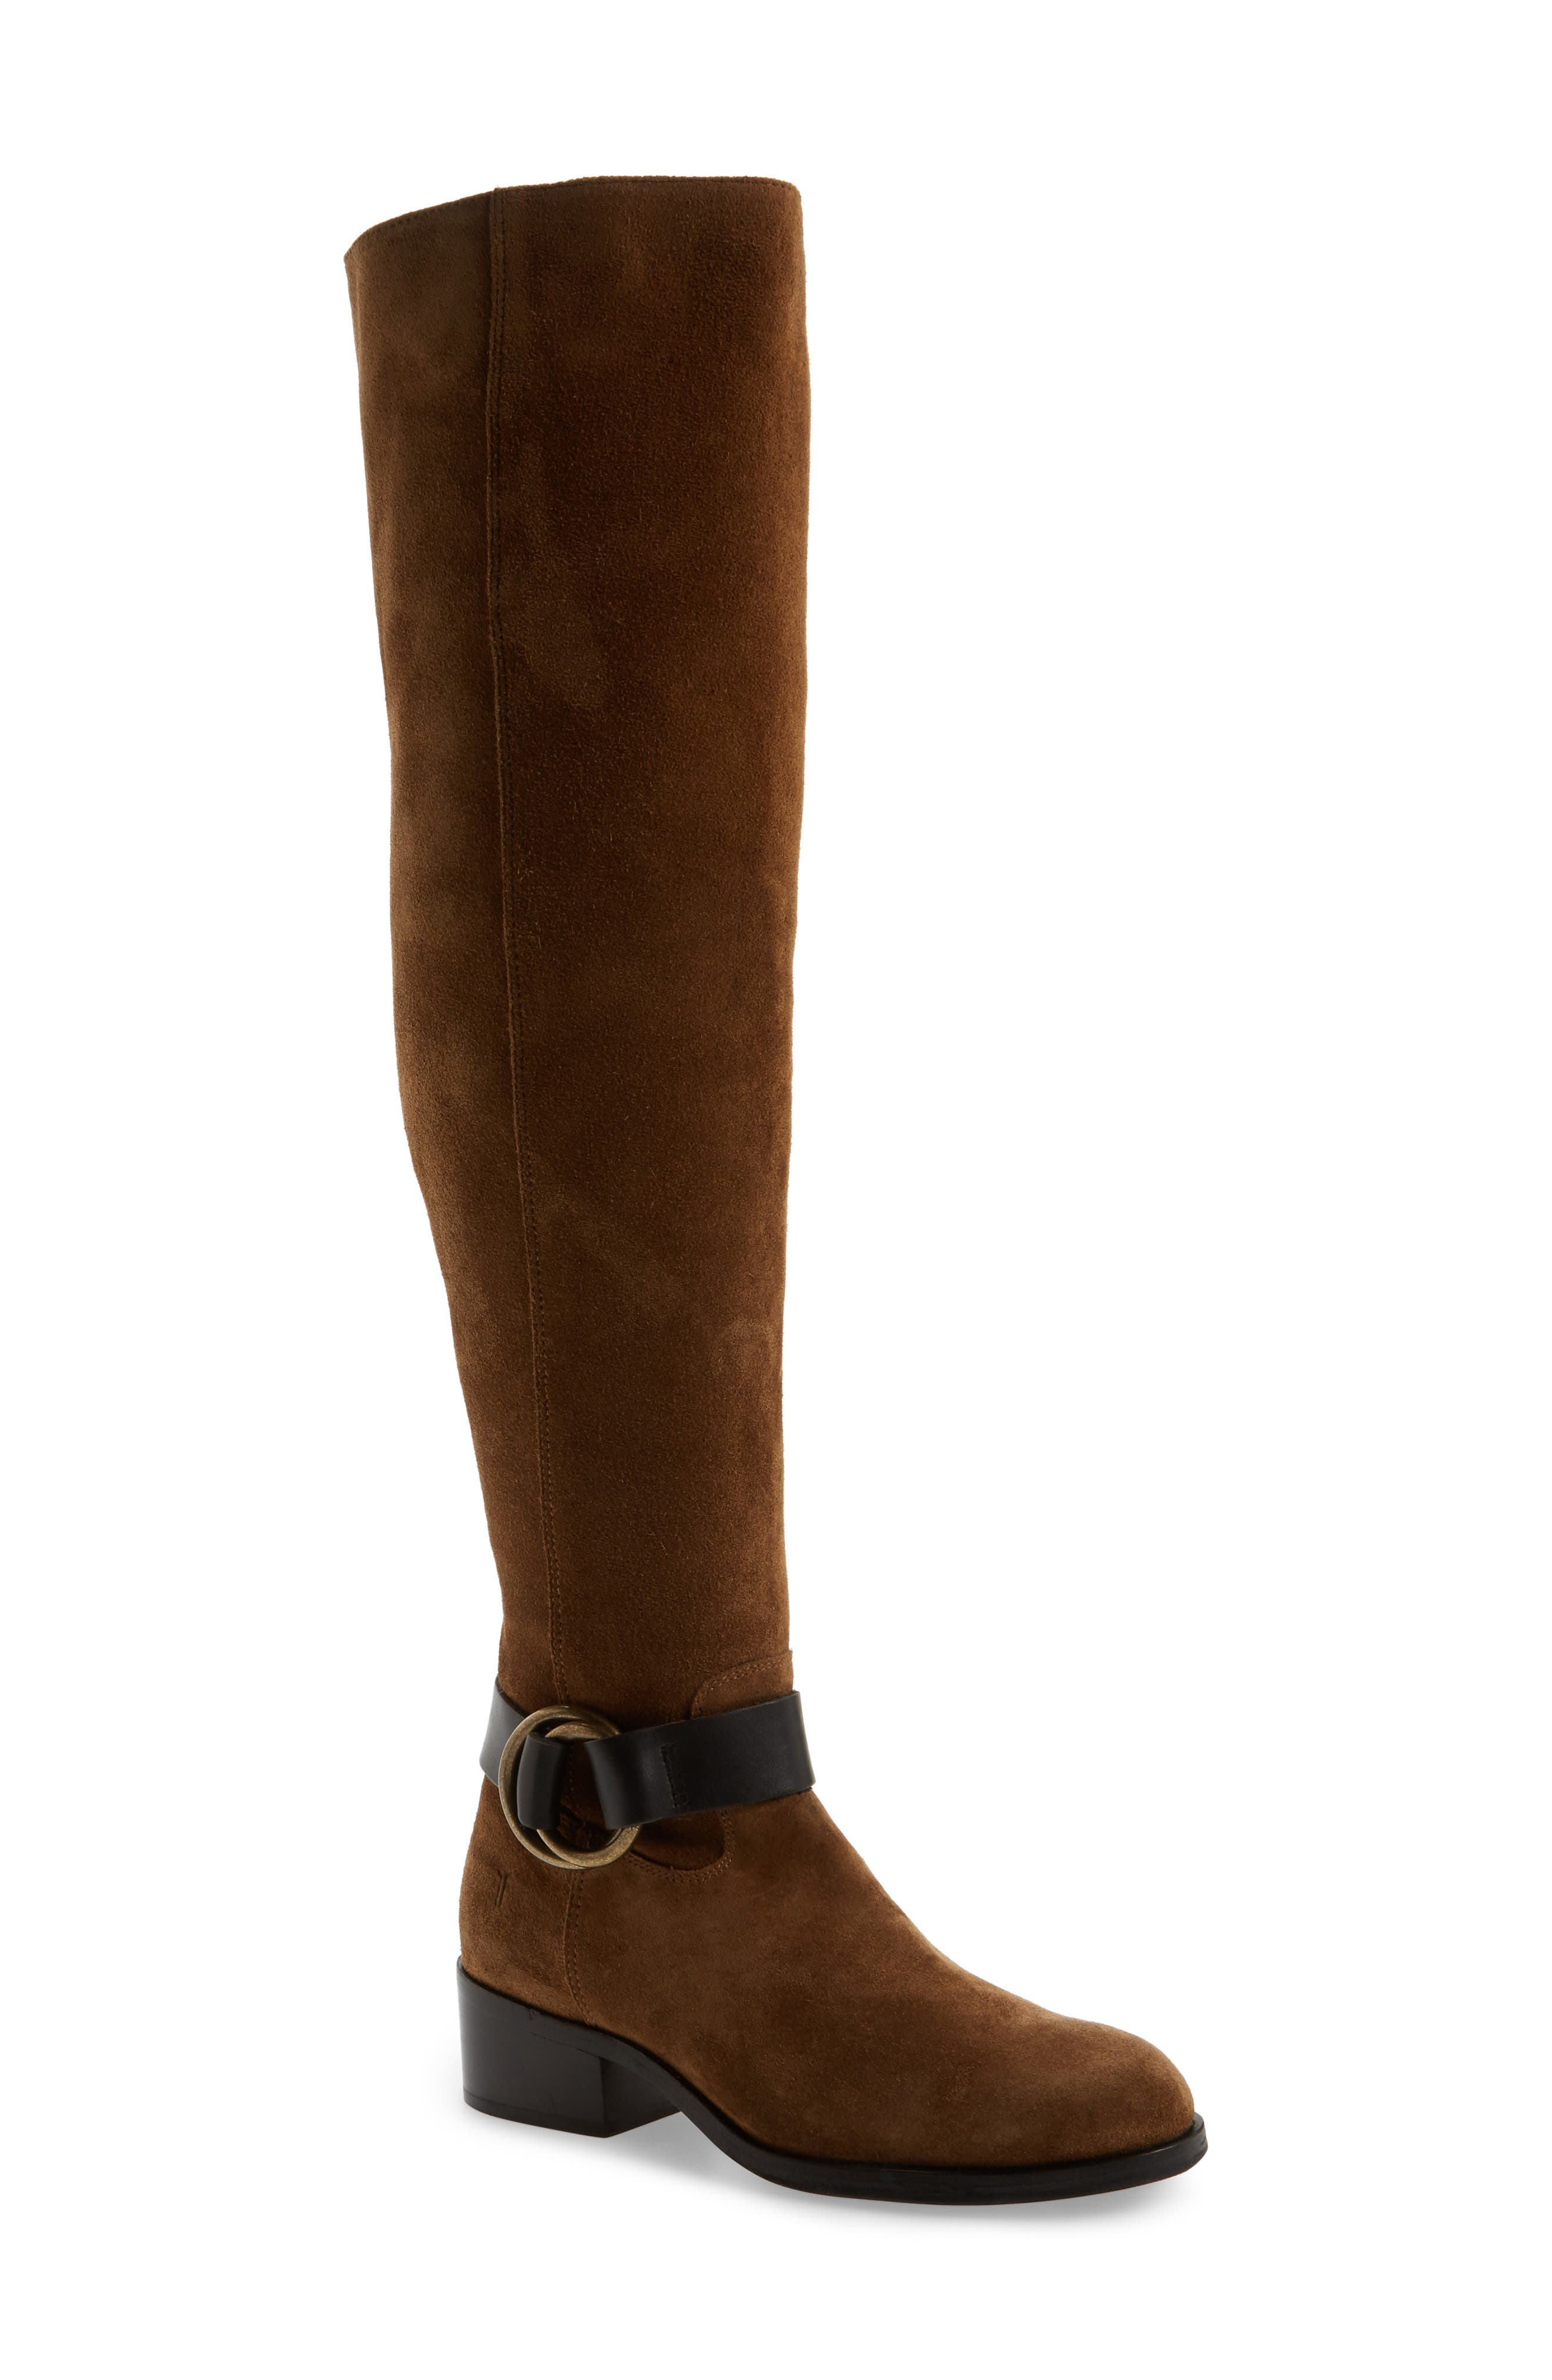 Main Image - Frye Kristen Harness Over the Knee Boot (Women)